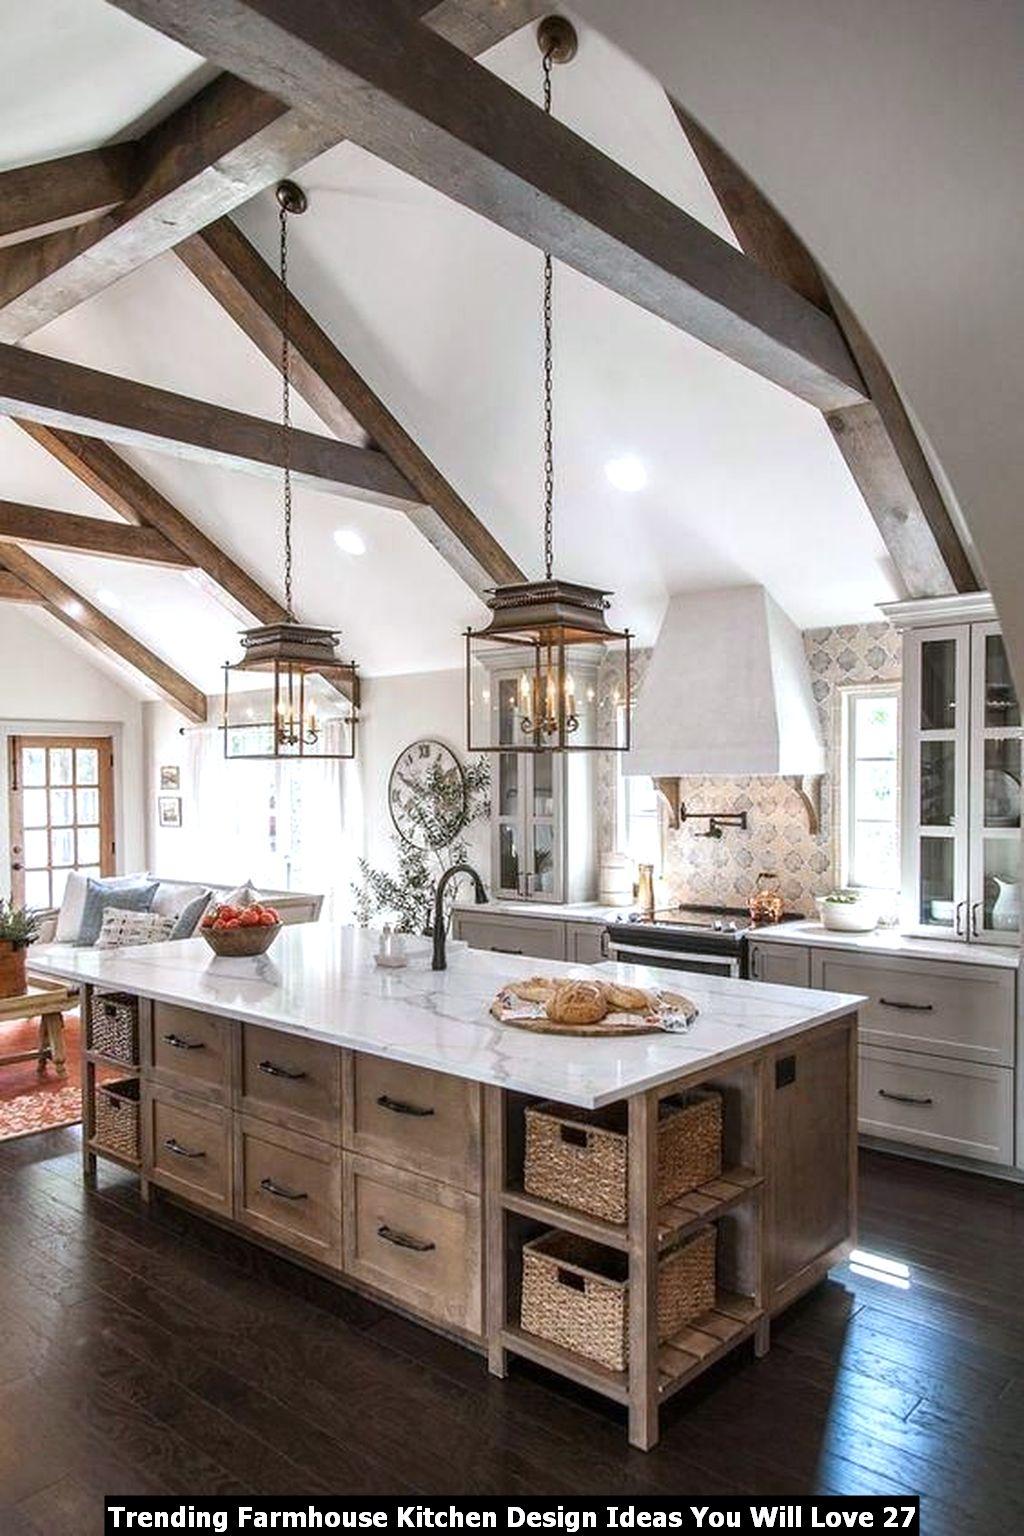 Trending Farmhouse Kitchen Design Ideas You Will Love 27